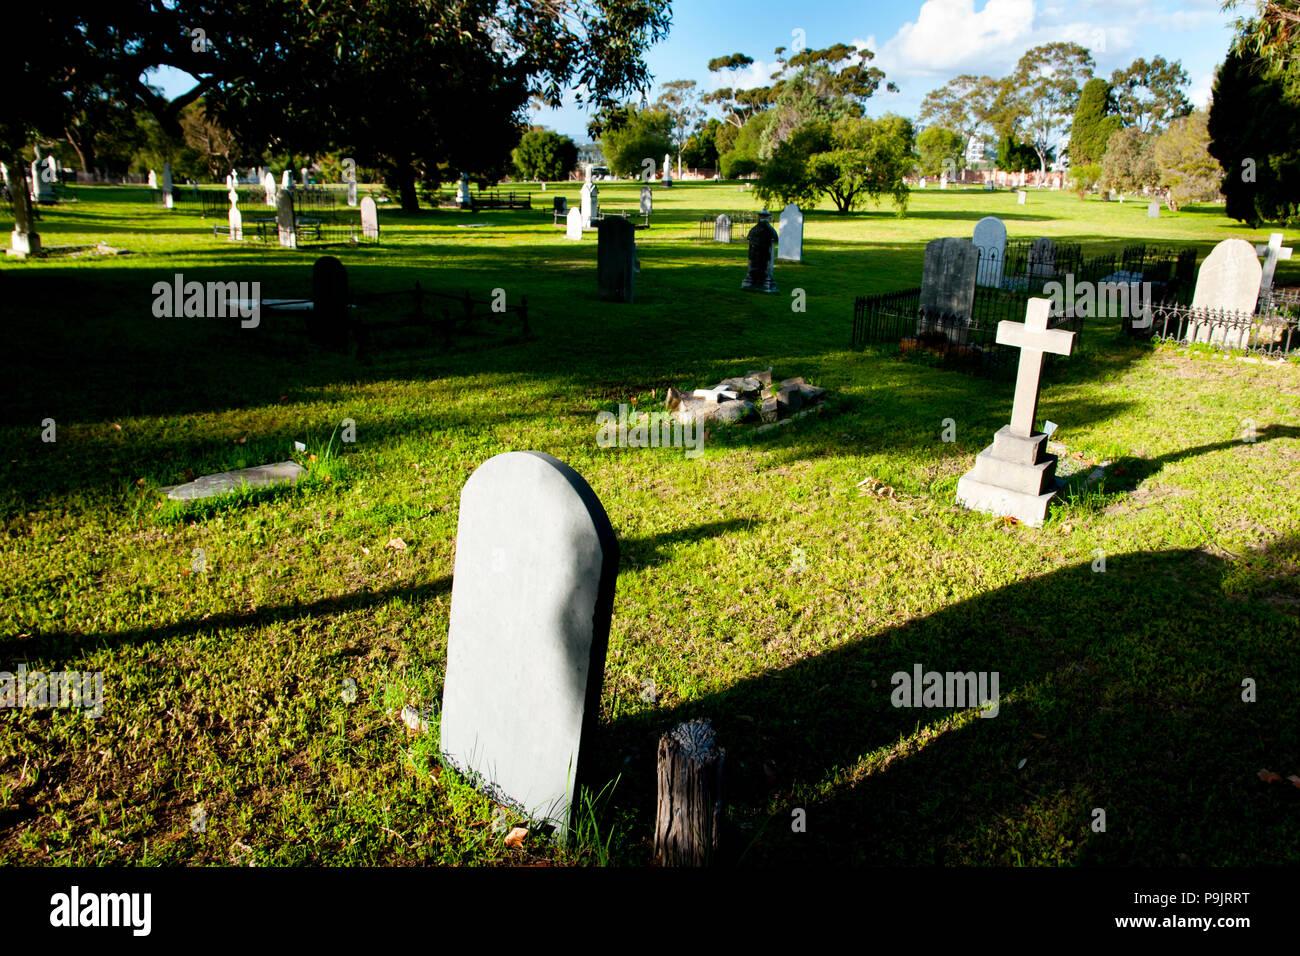 East Perth Cemeteries - Australia - Stock Image